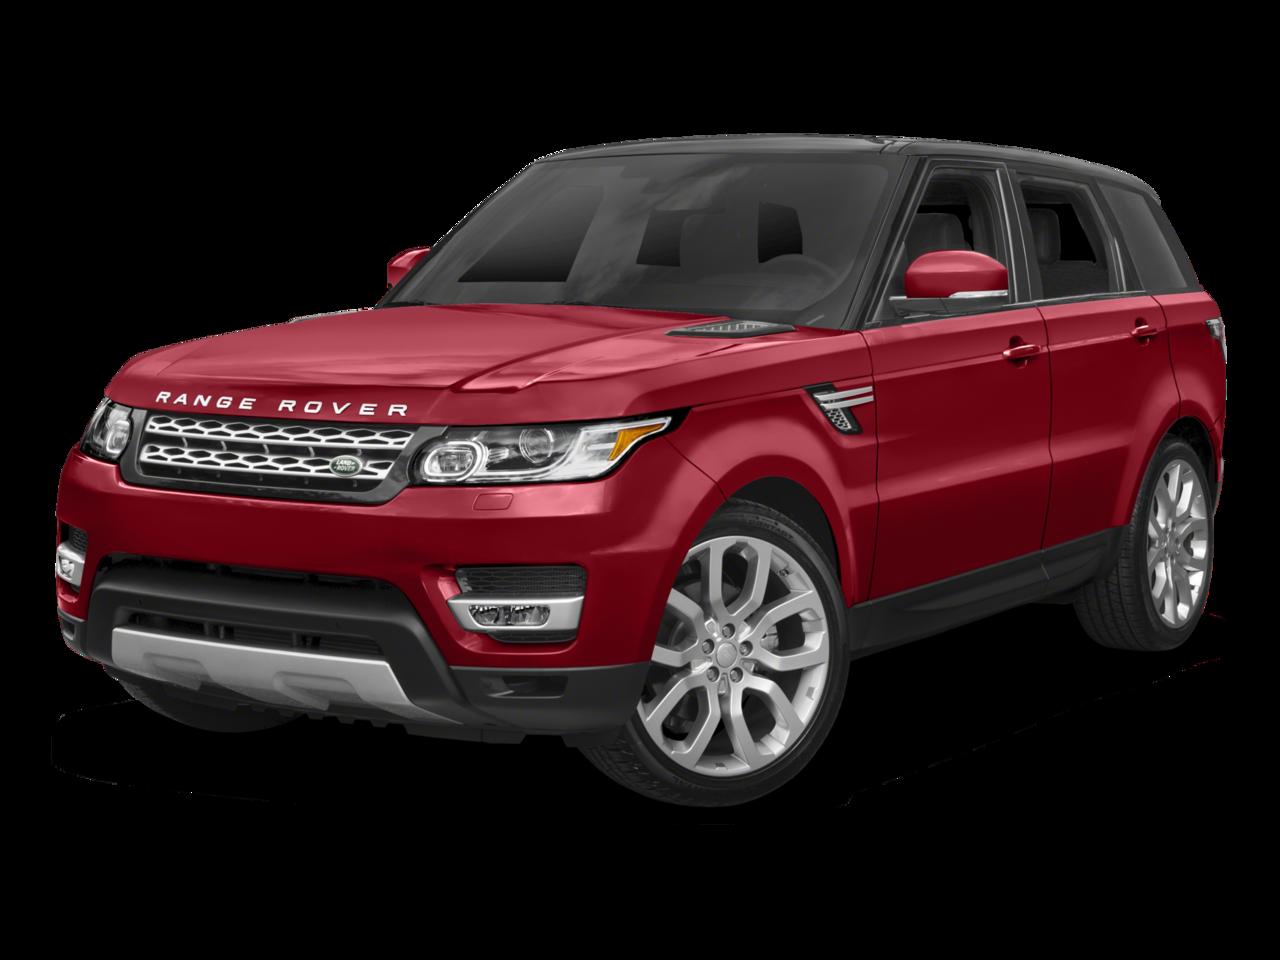 2017 Land Rover Range Rover Sport V8 Supercharged SVR VDP CarHub